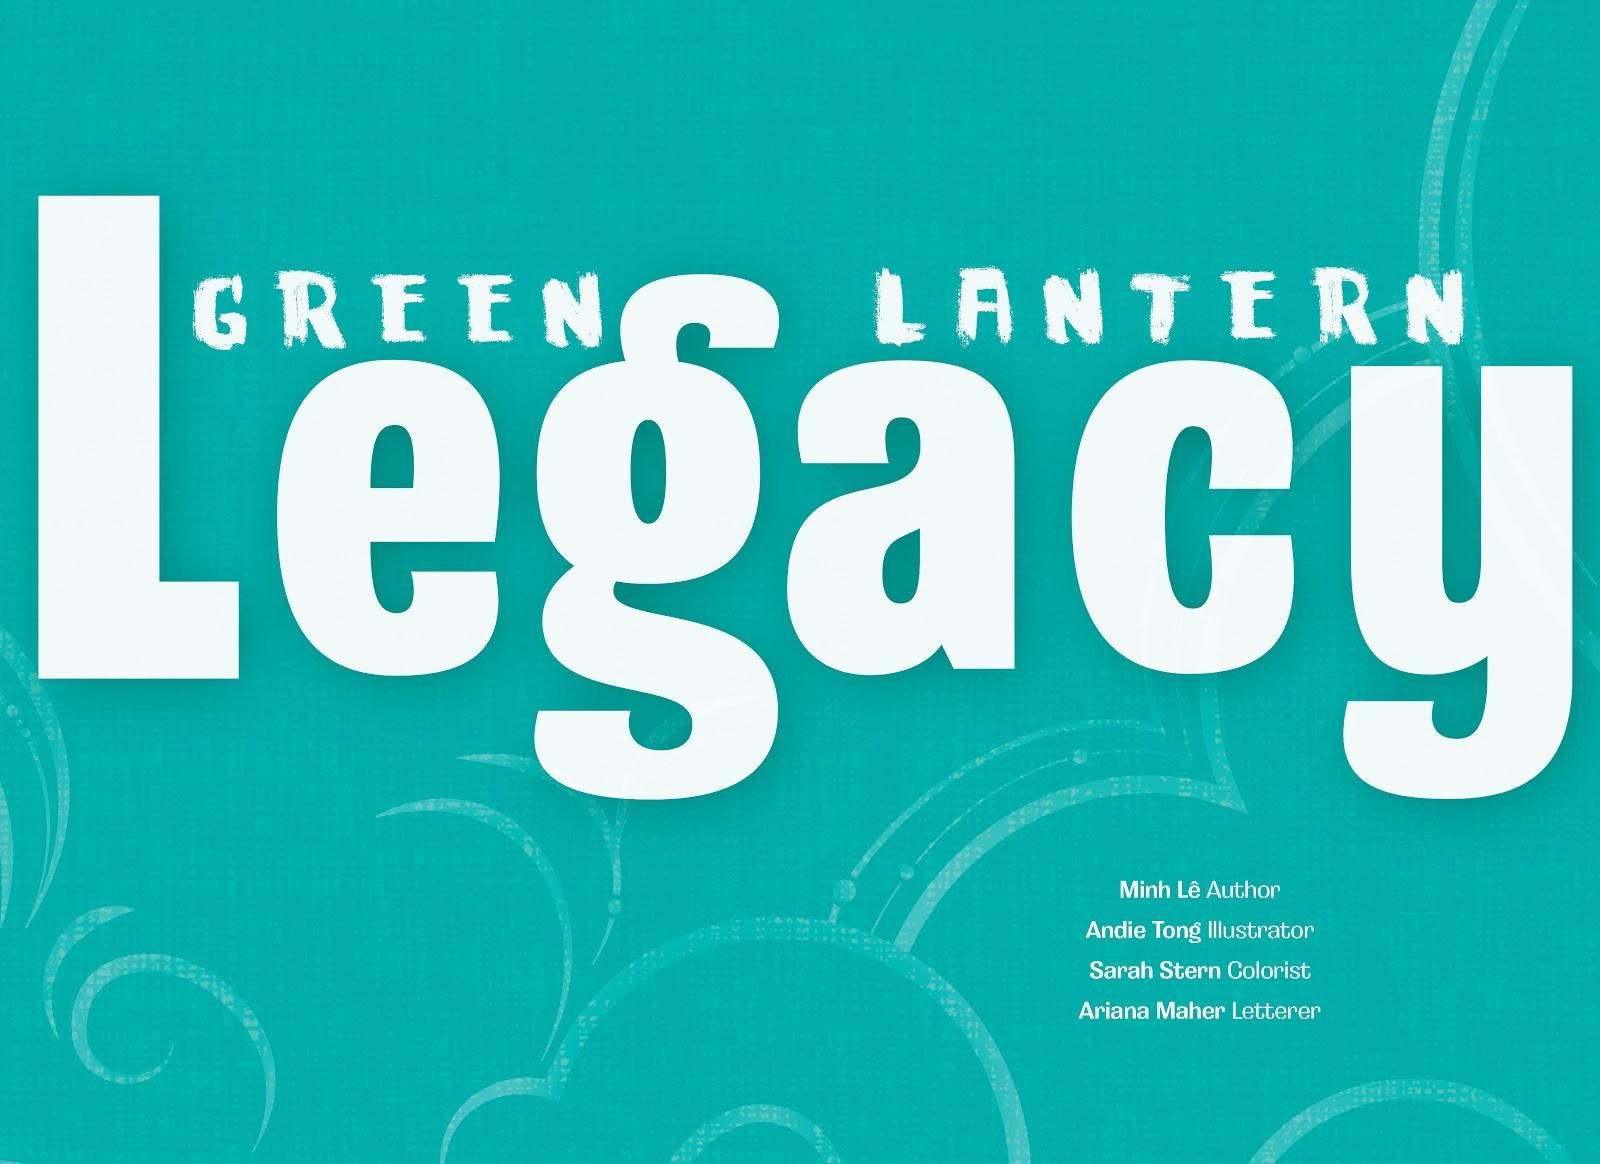 Read online Green Lantern: Legacy comic -  Issue # TPB - 3